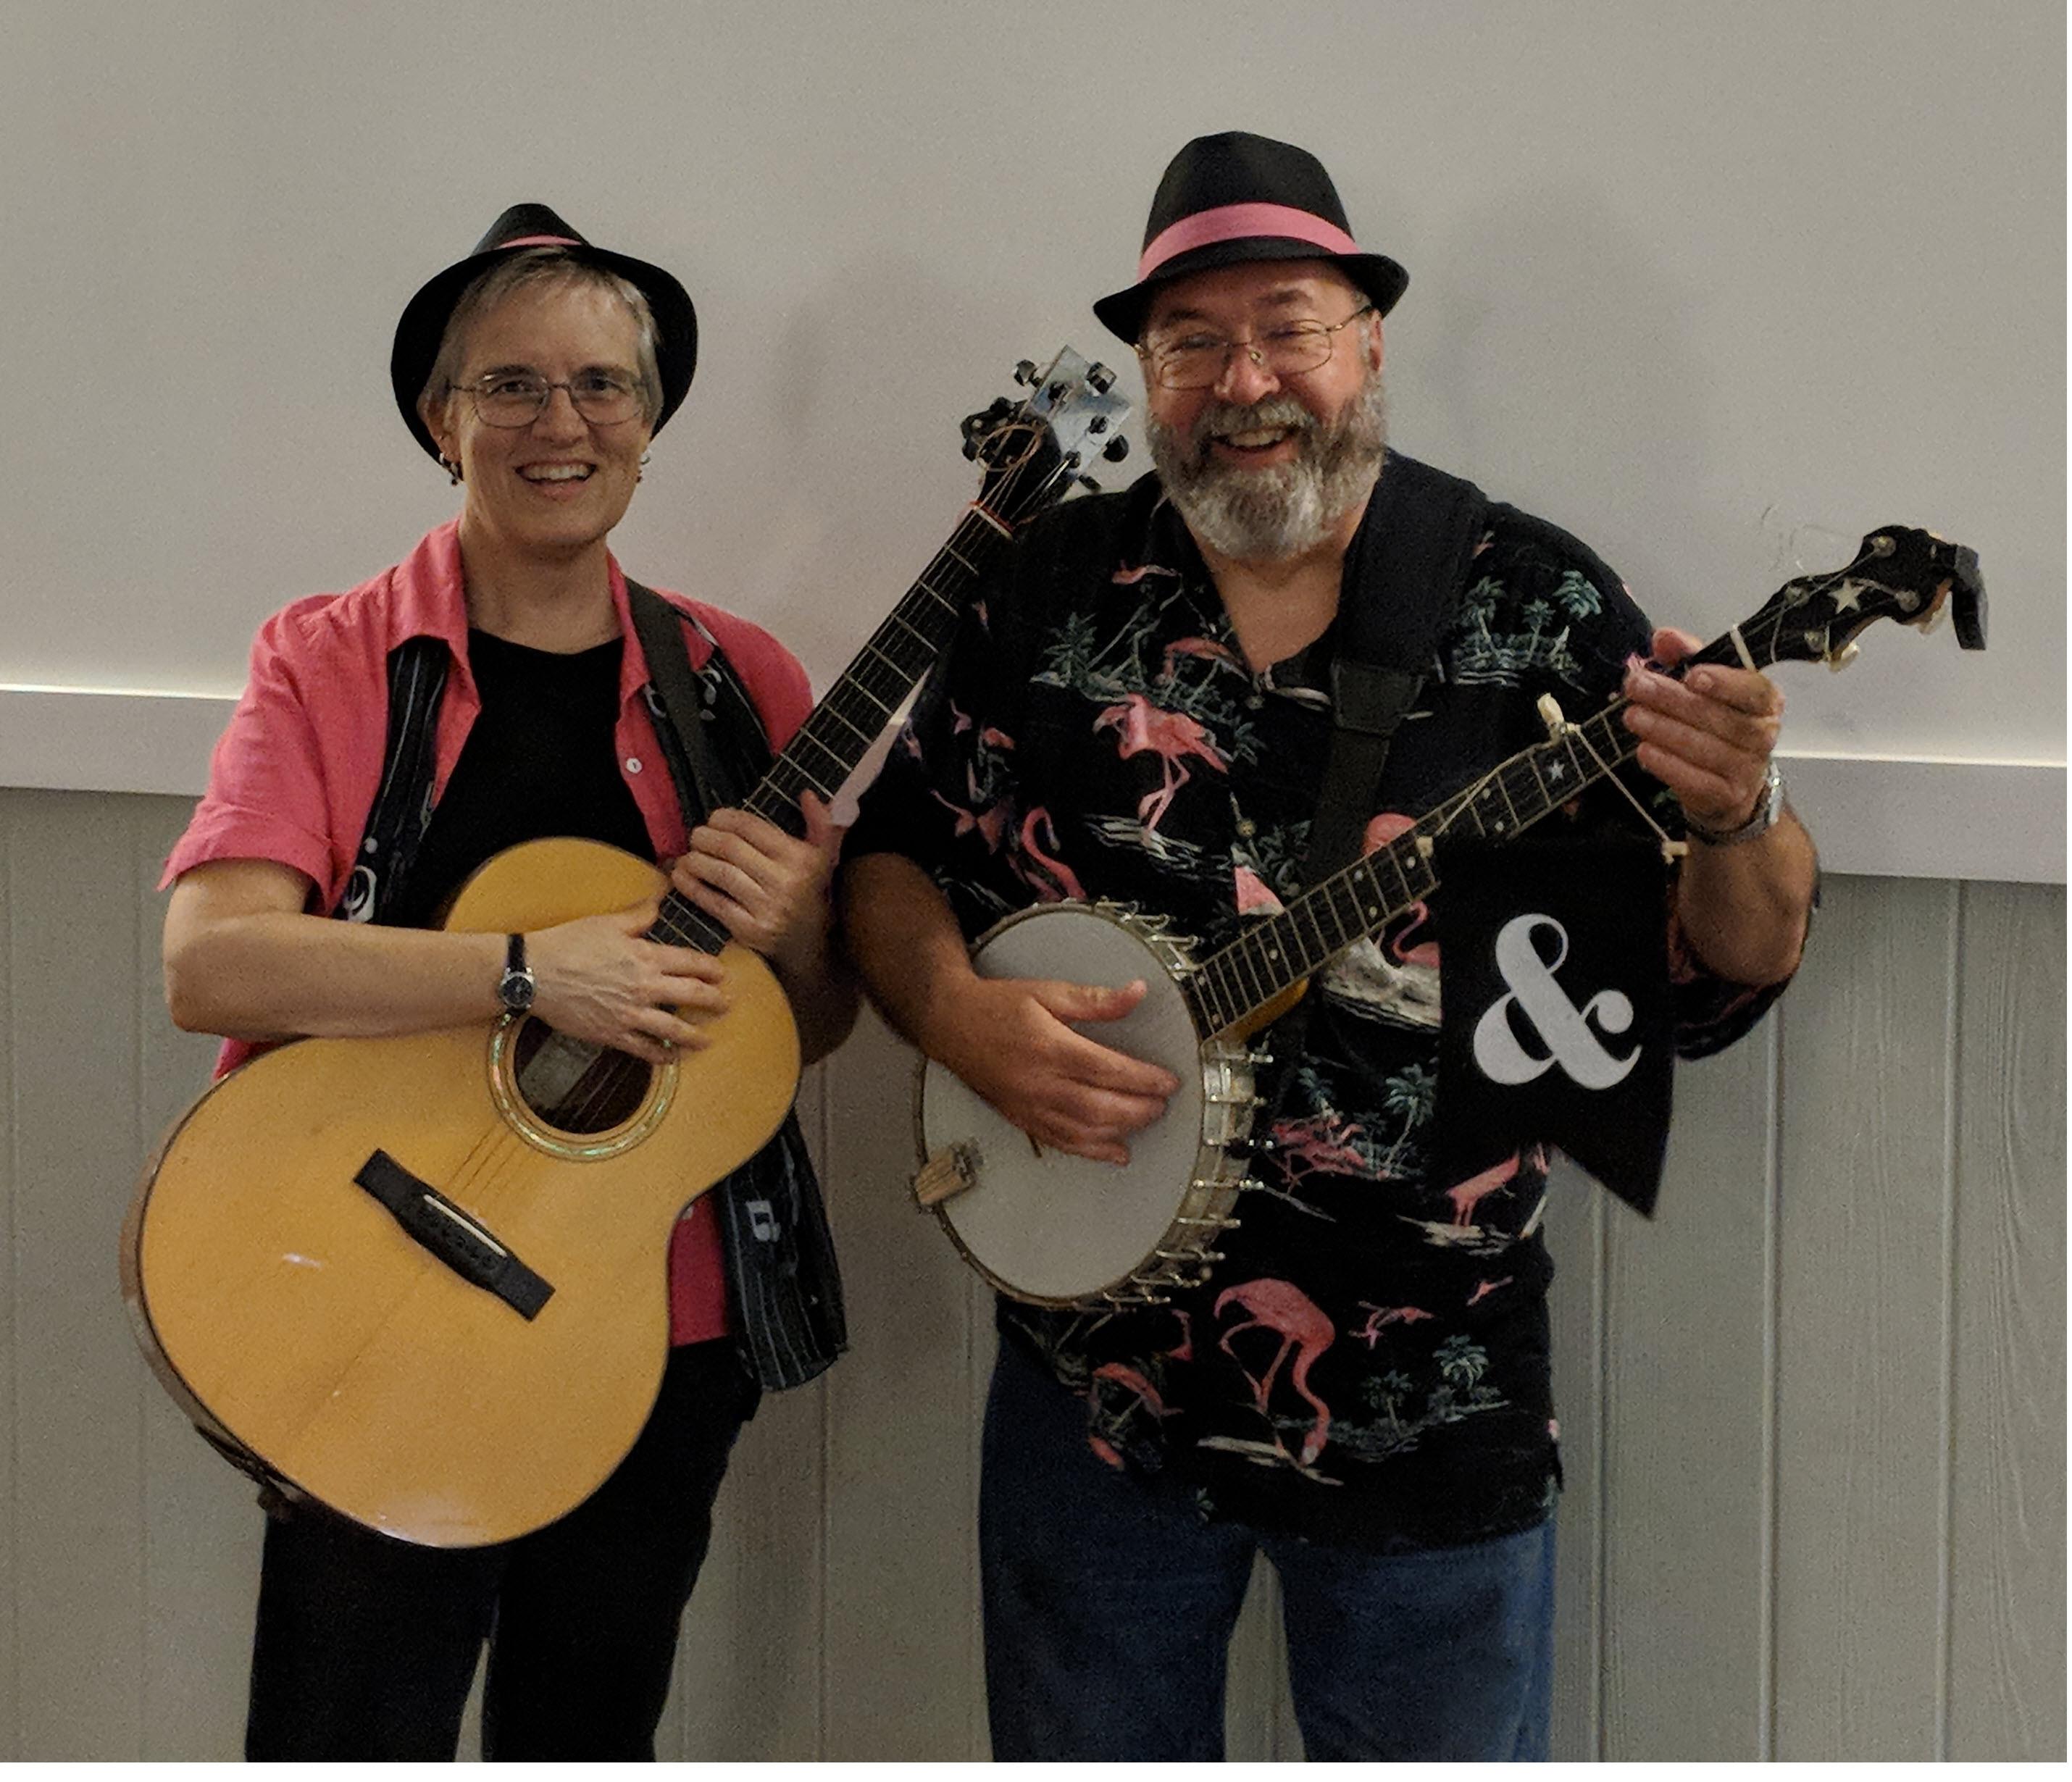 Two musicians, guitar, banjo